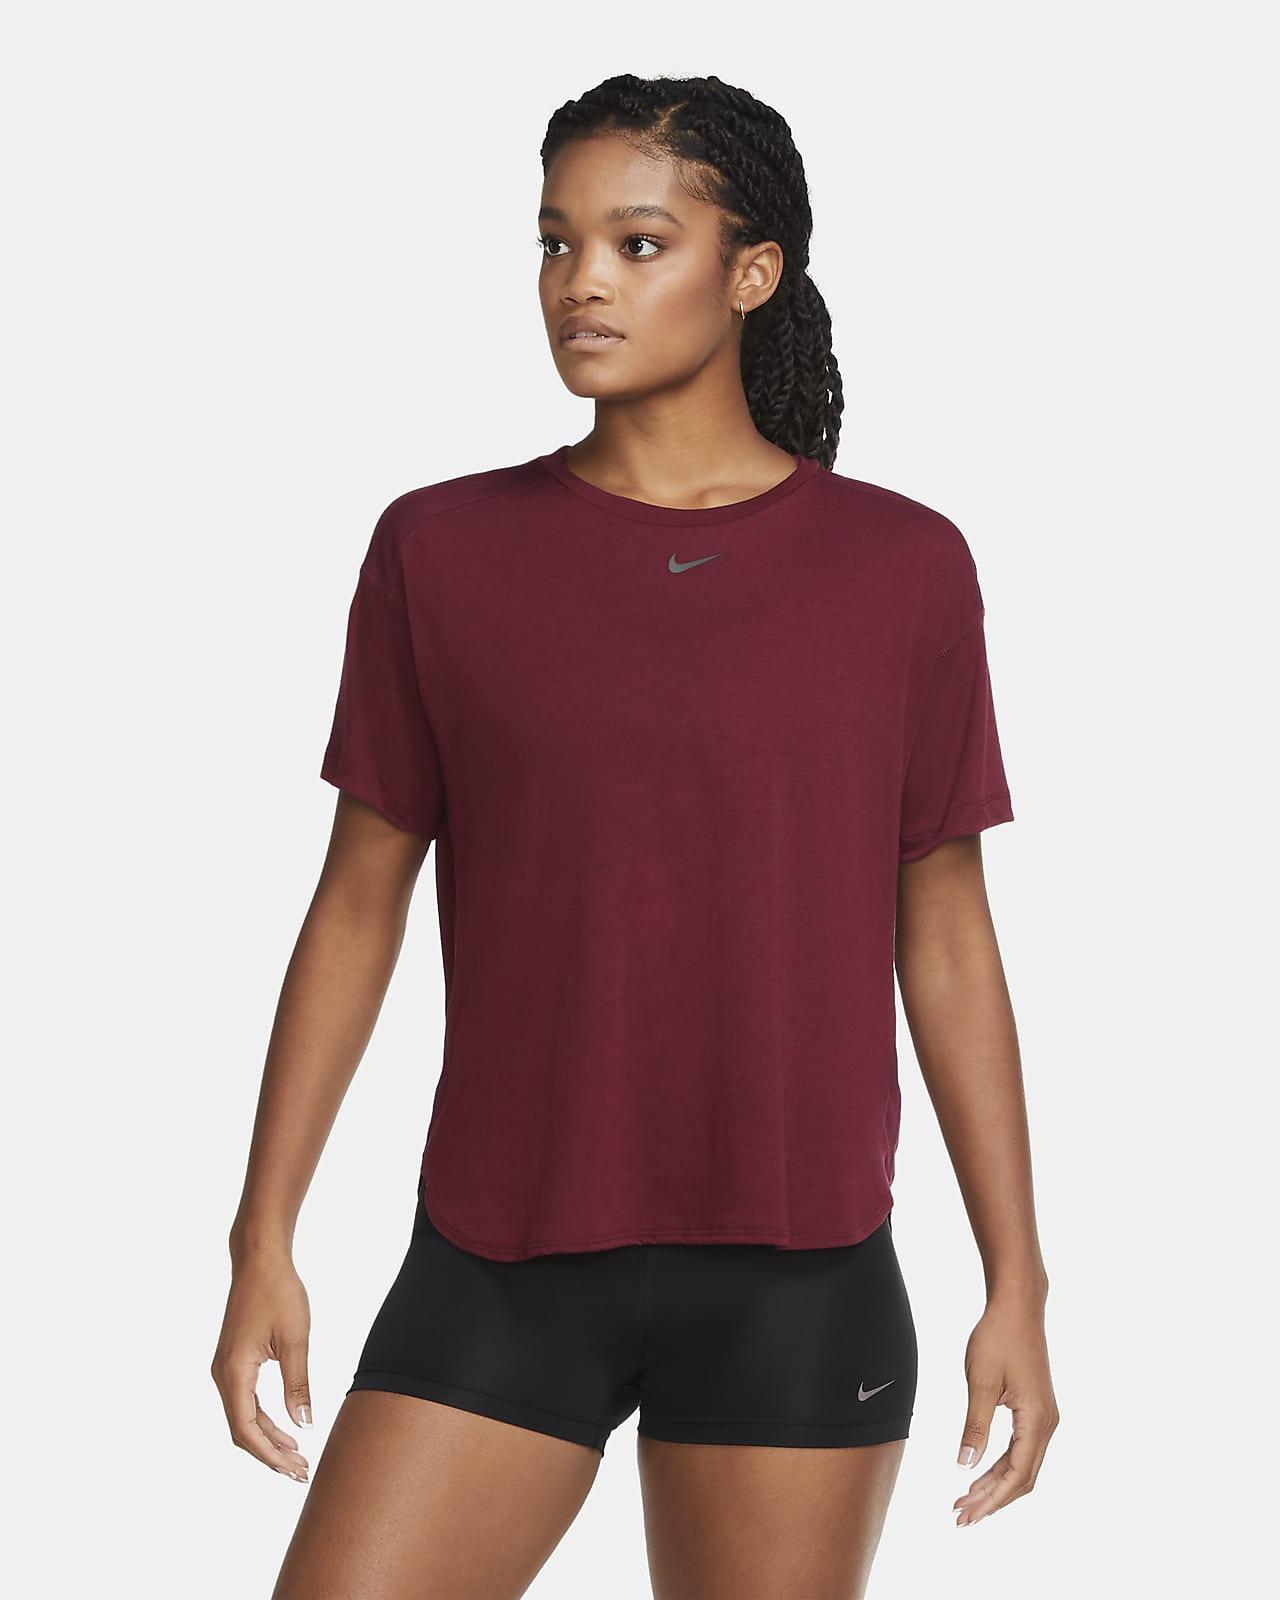 Nike Pro AeroAdapt Women's Short-Sleeve Top